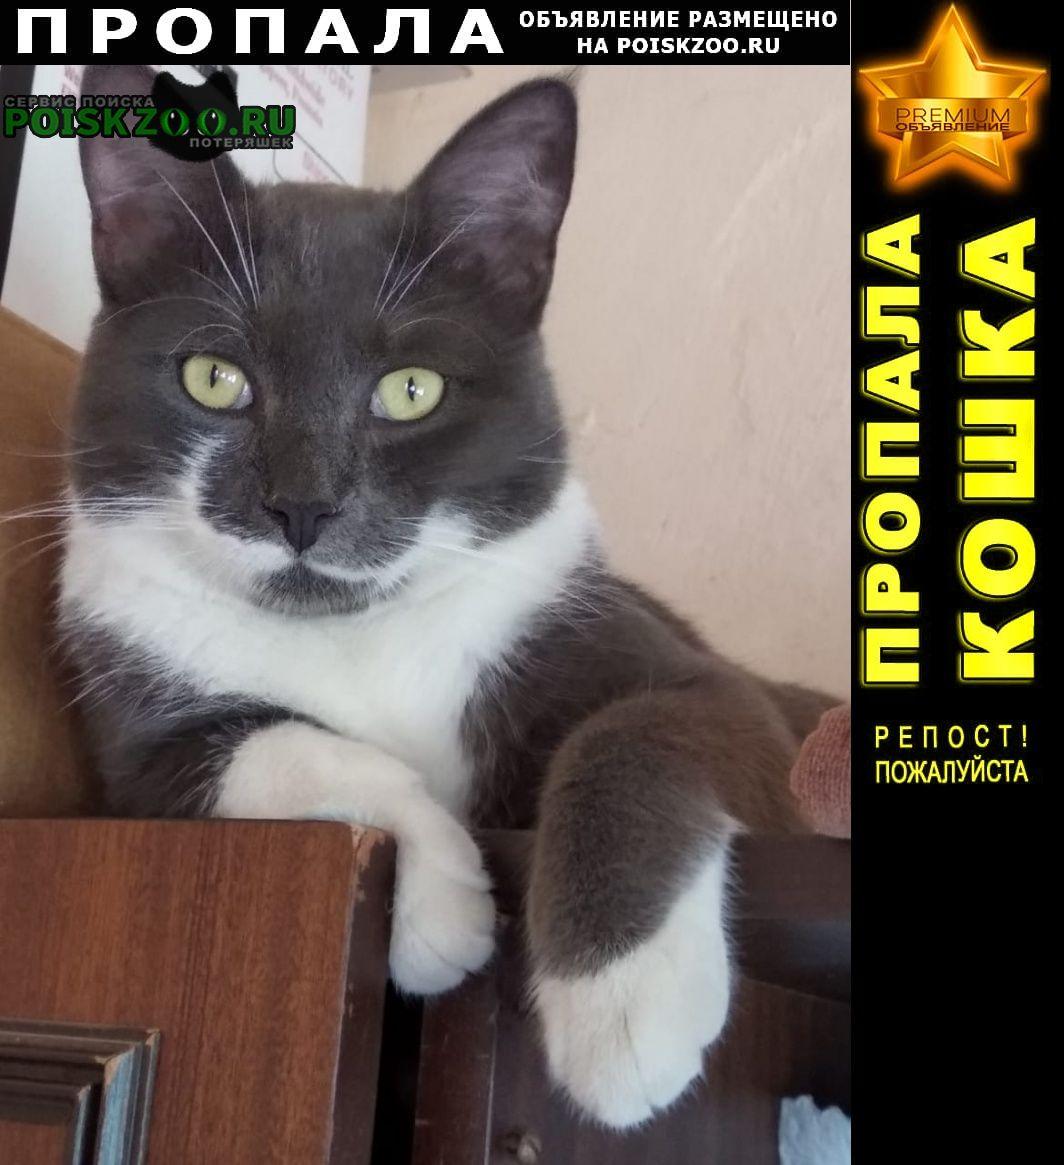 Пропала кошка Рязань